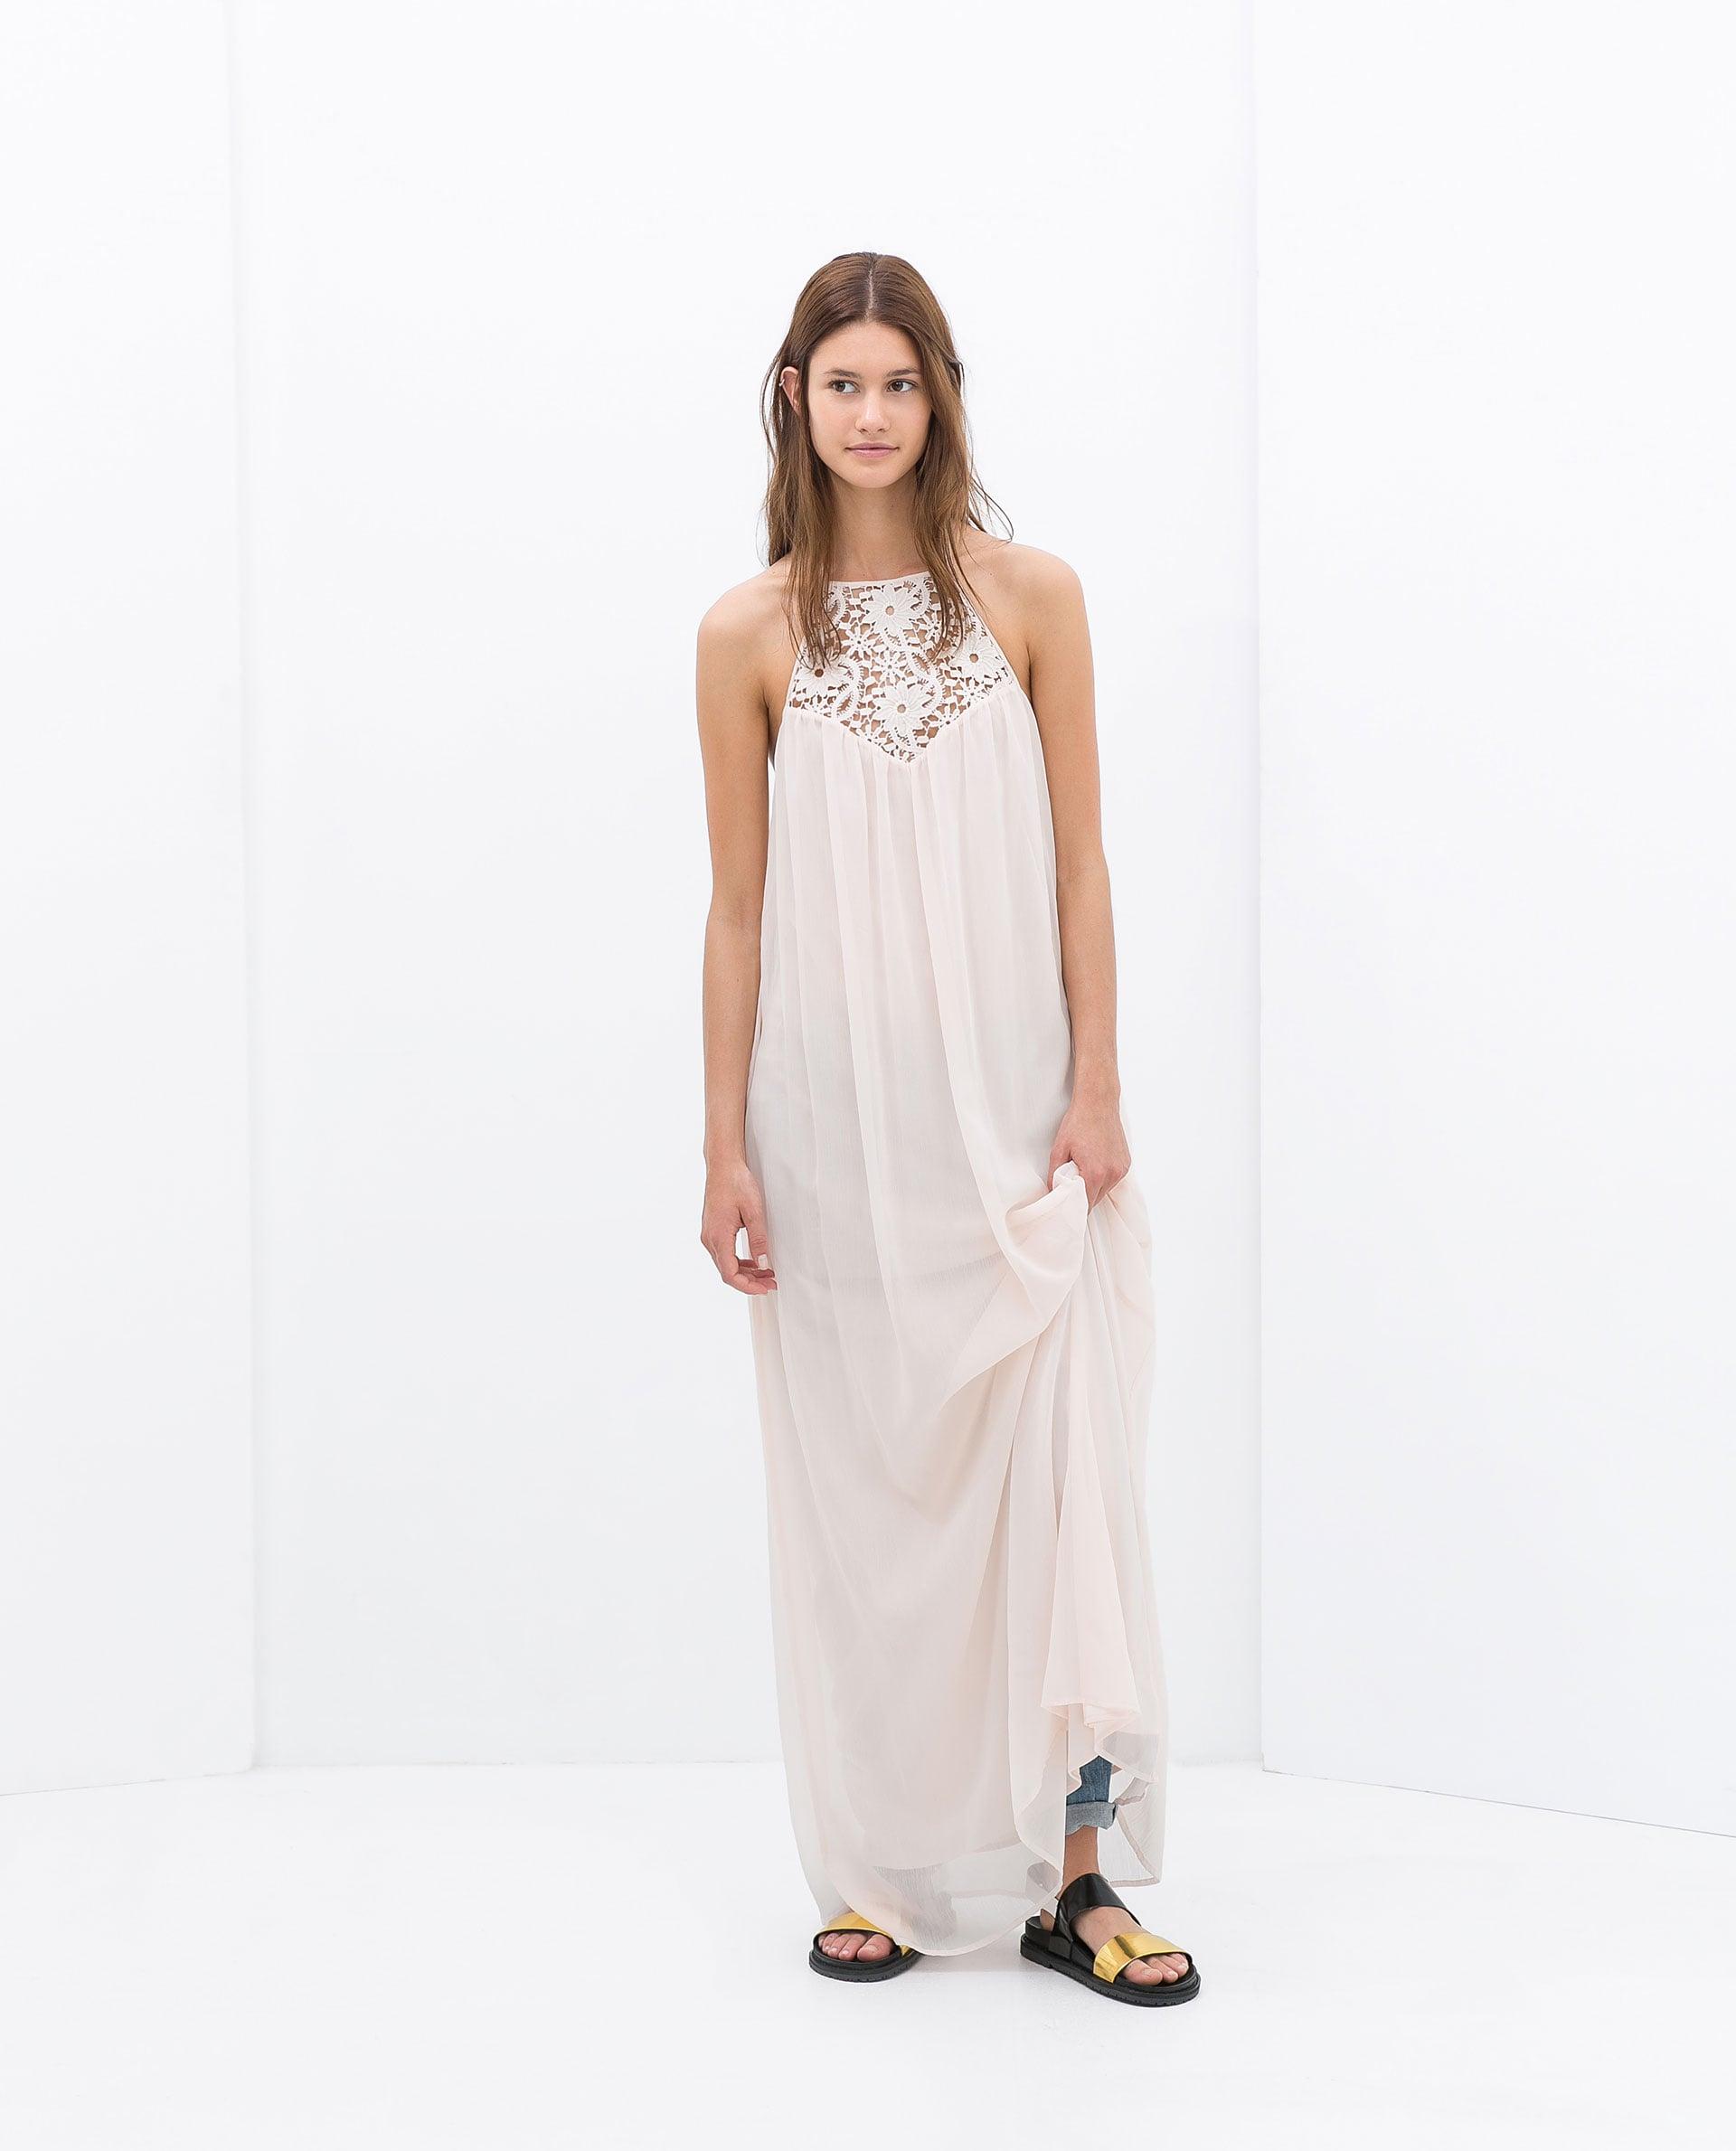 Zara Embroidered Maxi Dress